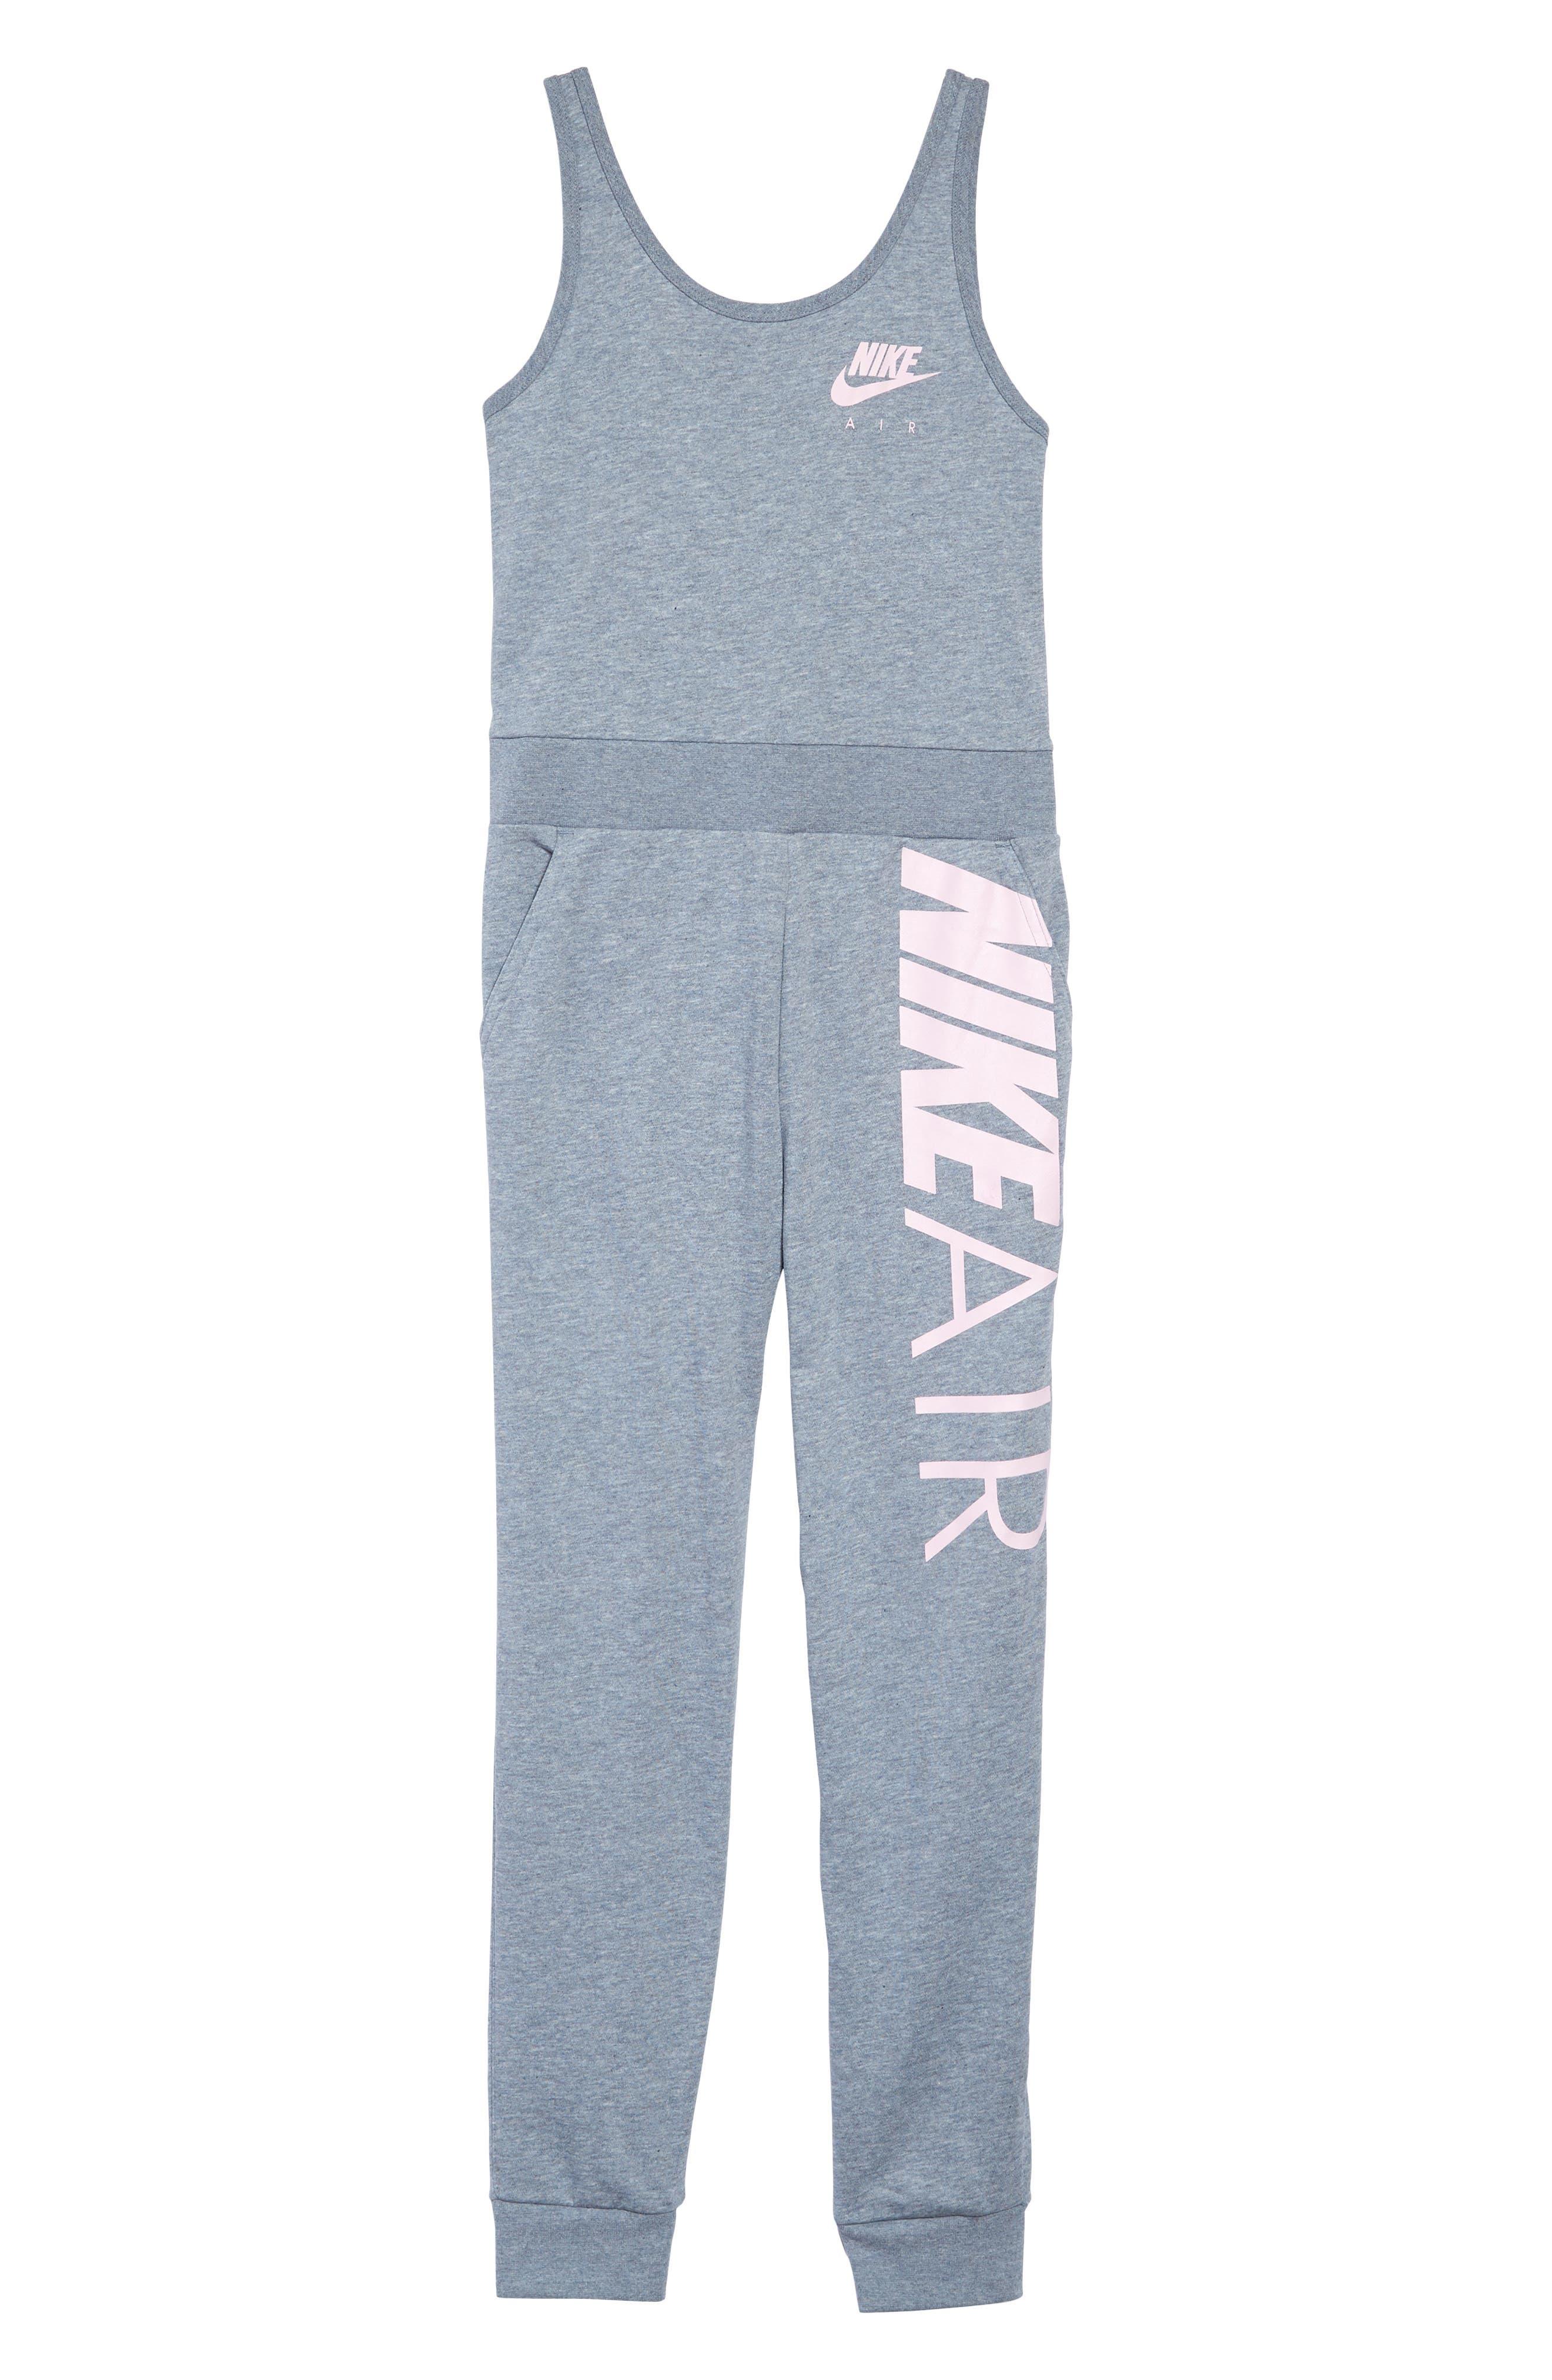 NIKE, Air Sleeveless Jumpsuit, Main thumbnail 1, color, ASHEN SLATE/ HTR/ PINK FOAM